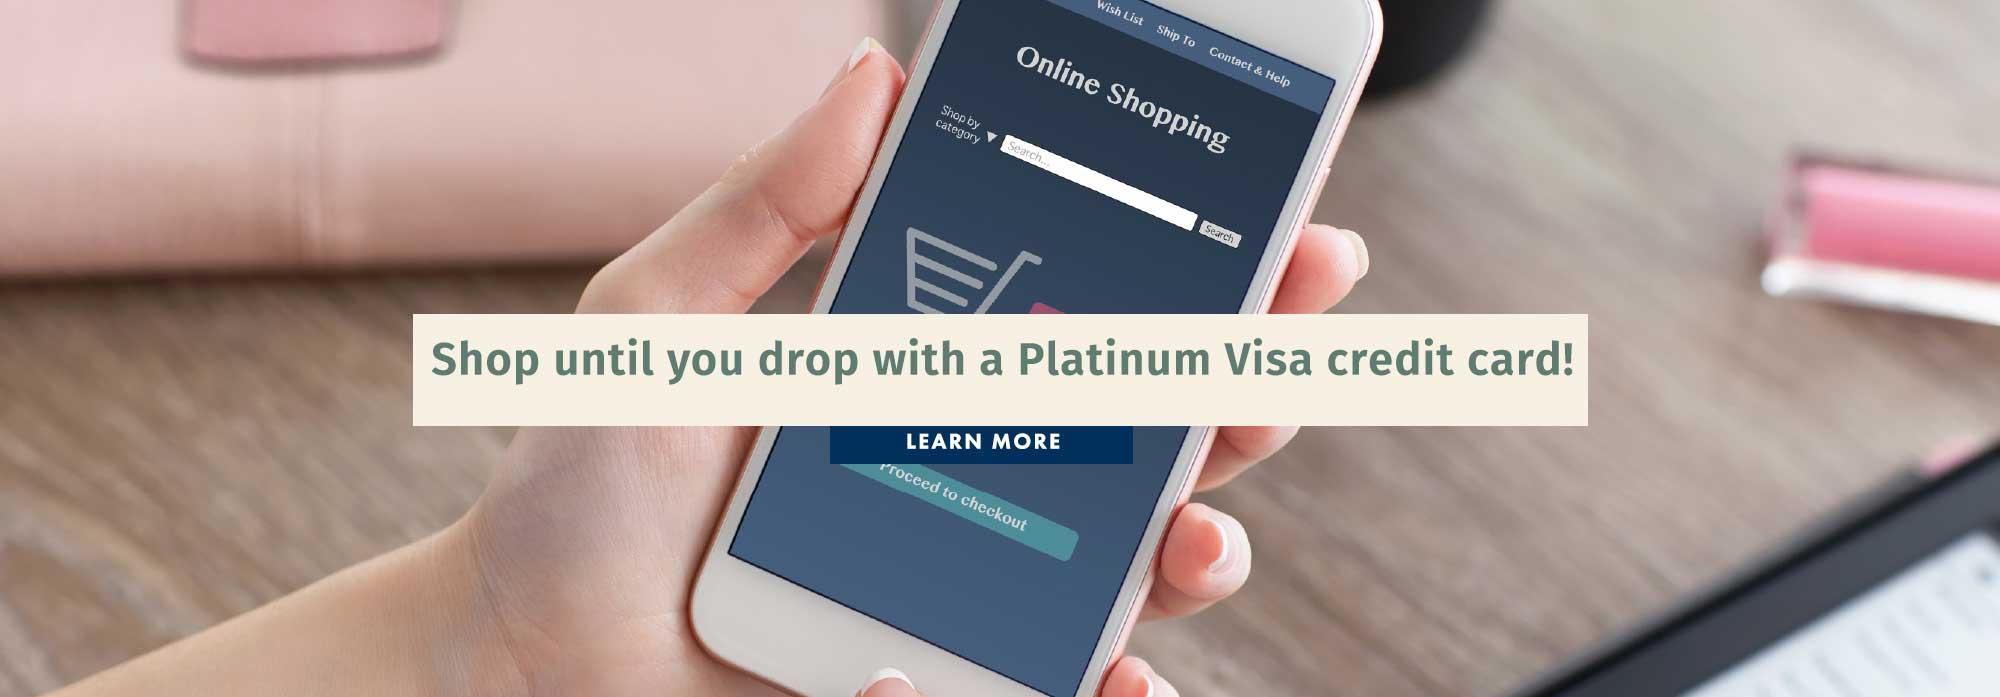 Shop until you drop with a Platinum Visa credit card!